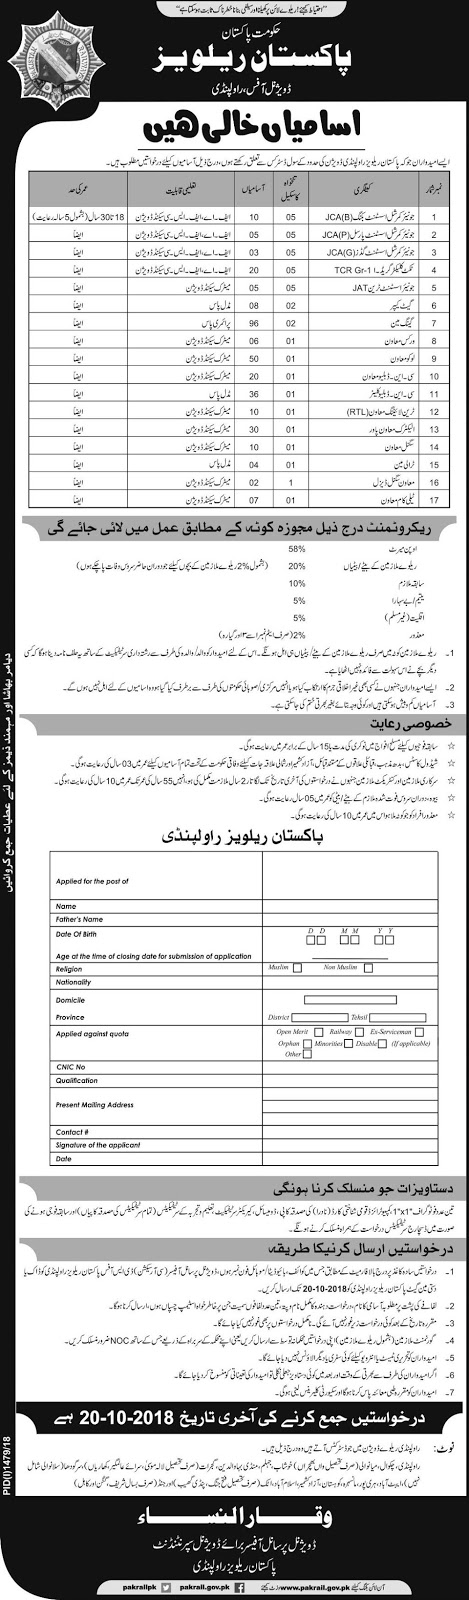 Latest Vacancies Announced in Pakistan Railways Rawalpindi 1 October 2018 Application form Download - Naya Pak Jobs